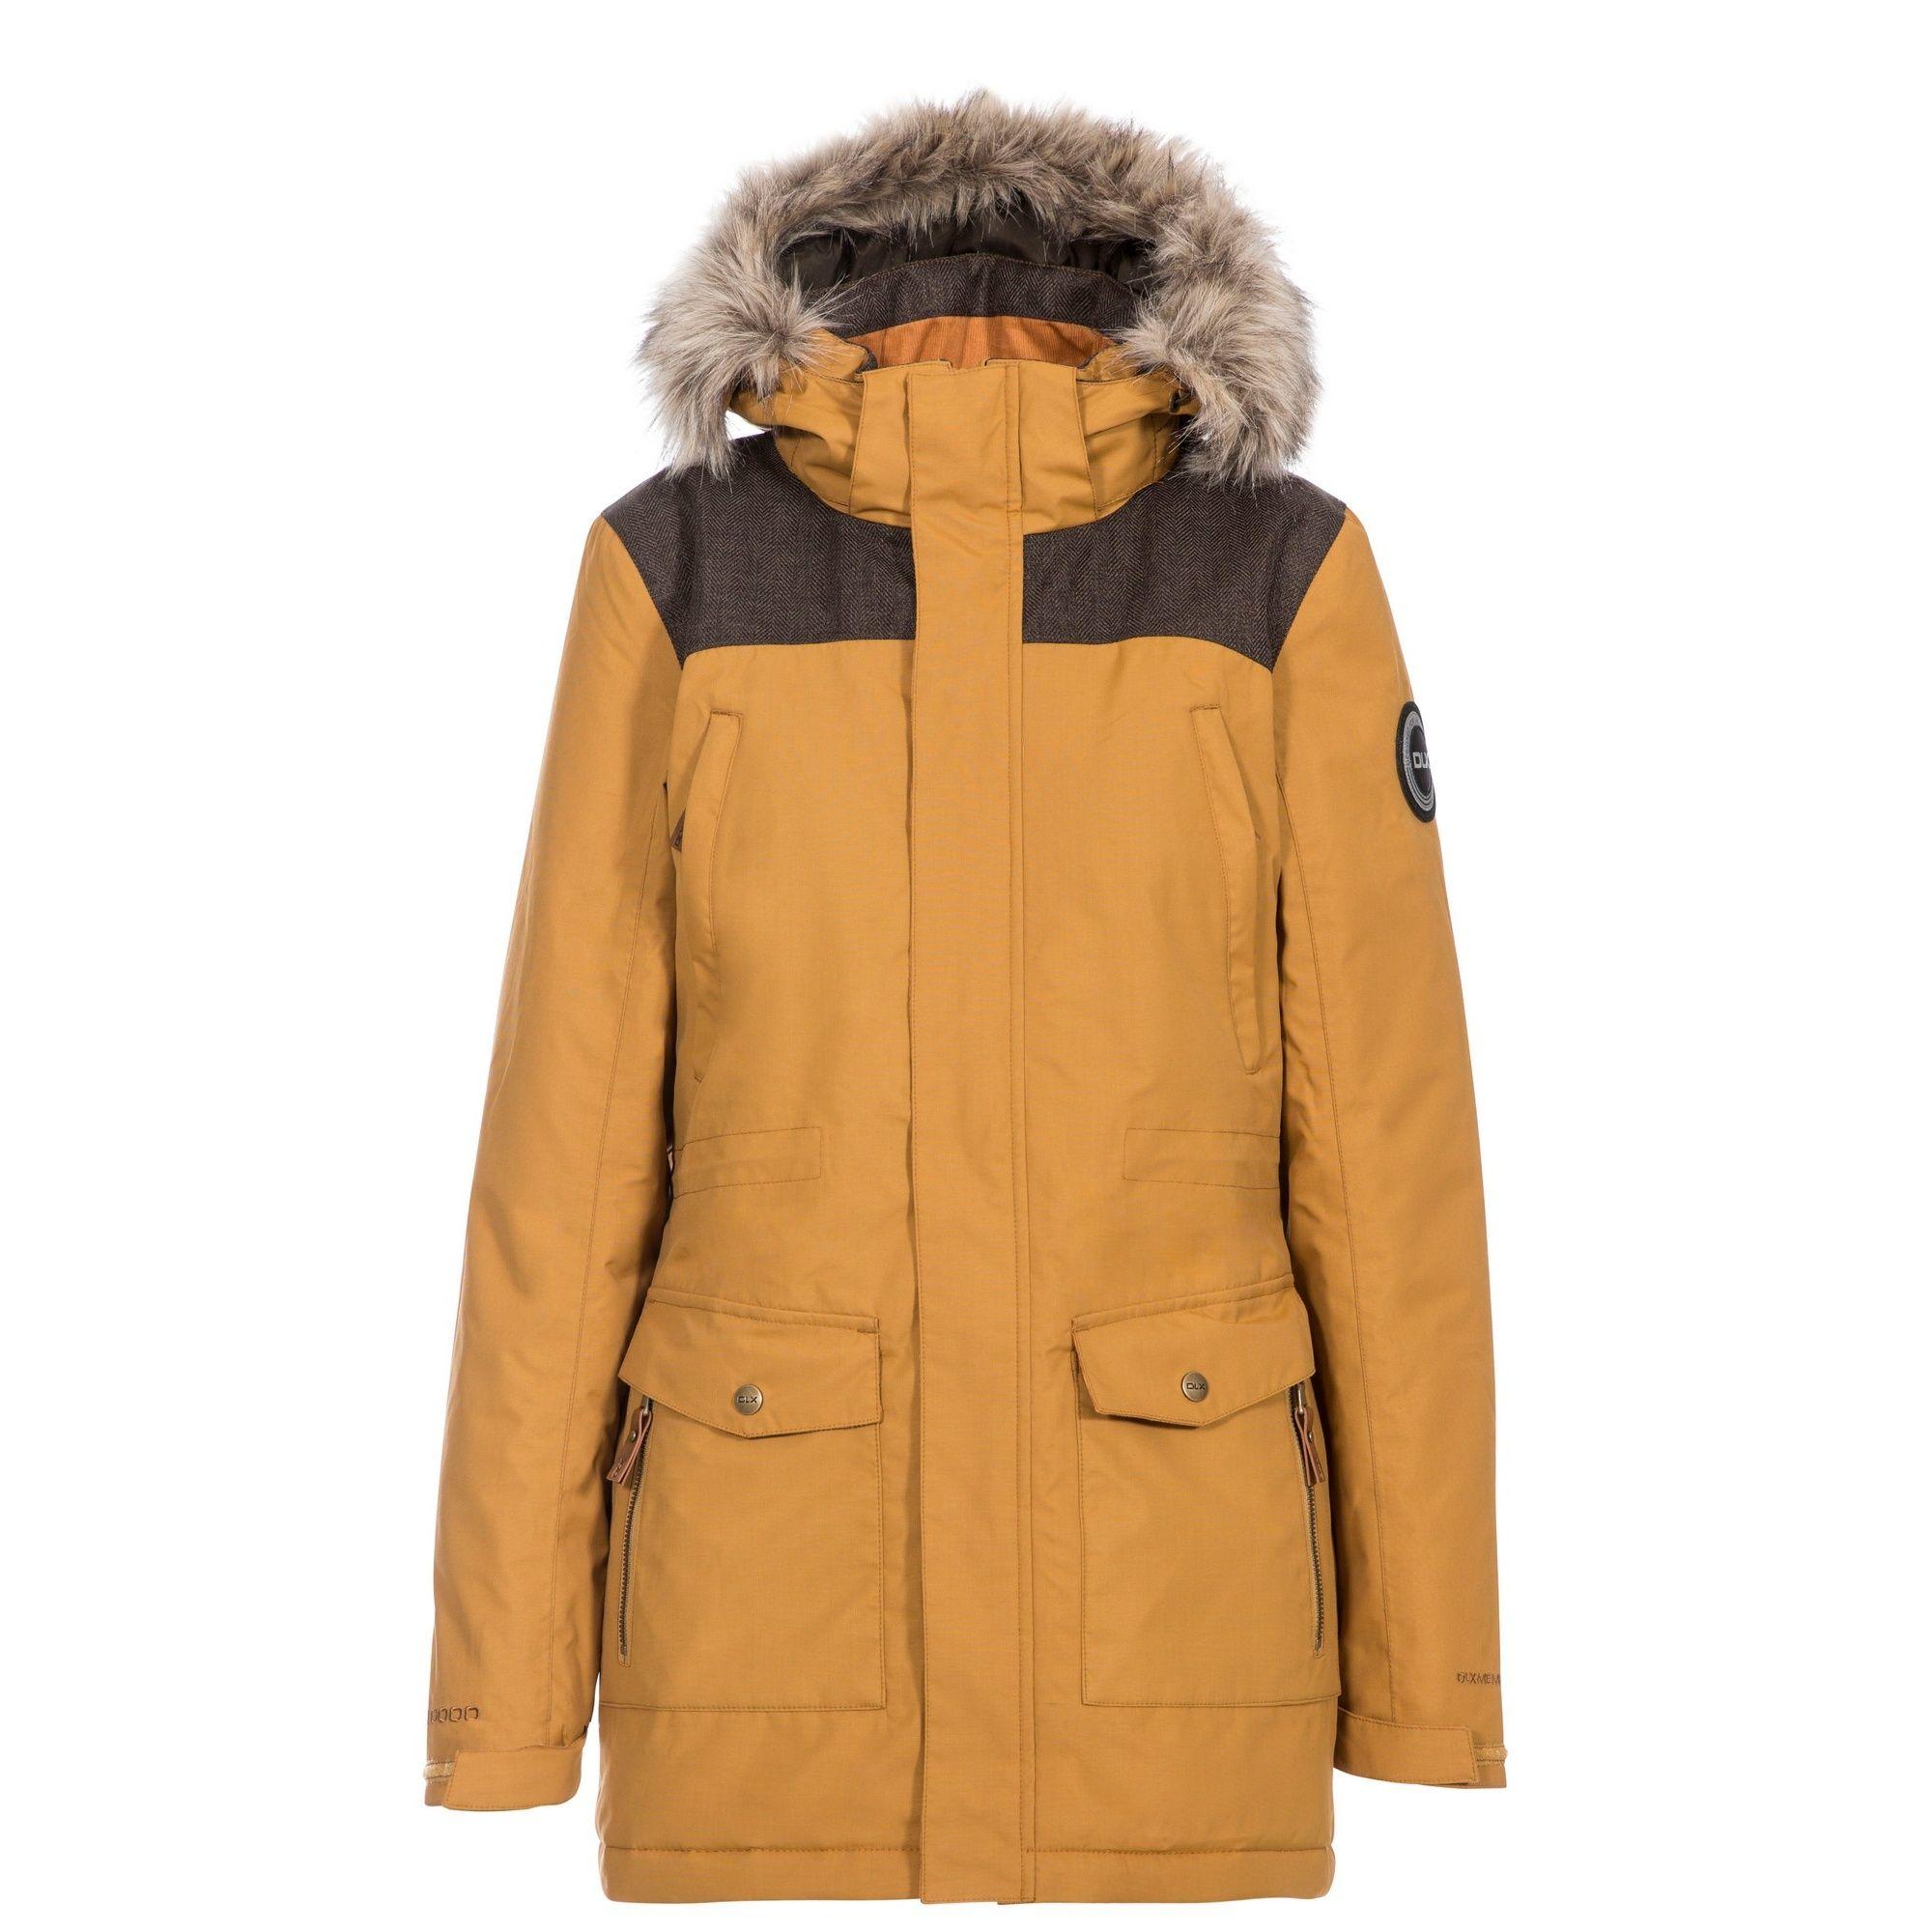 Trespass Womens/Ladies Rosario Waterproof Jacket